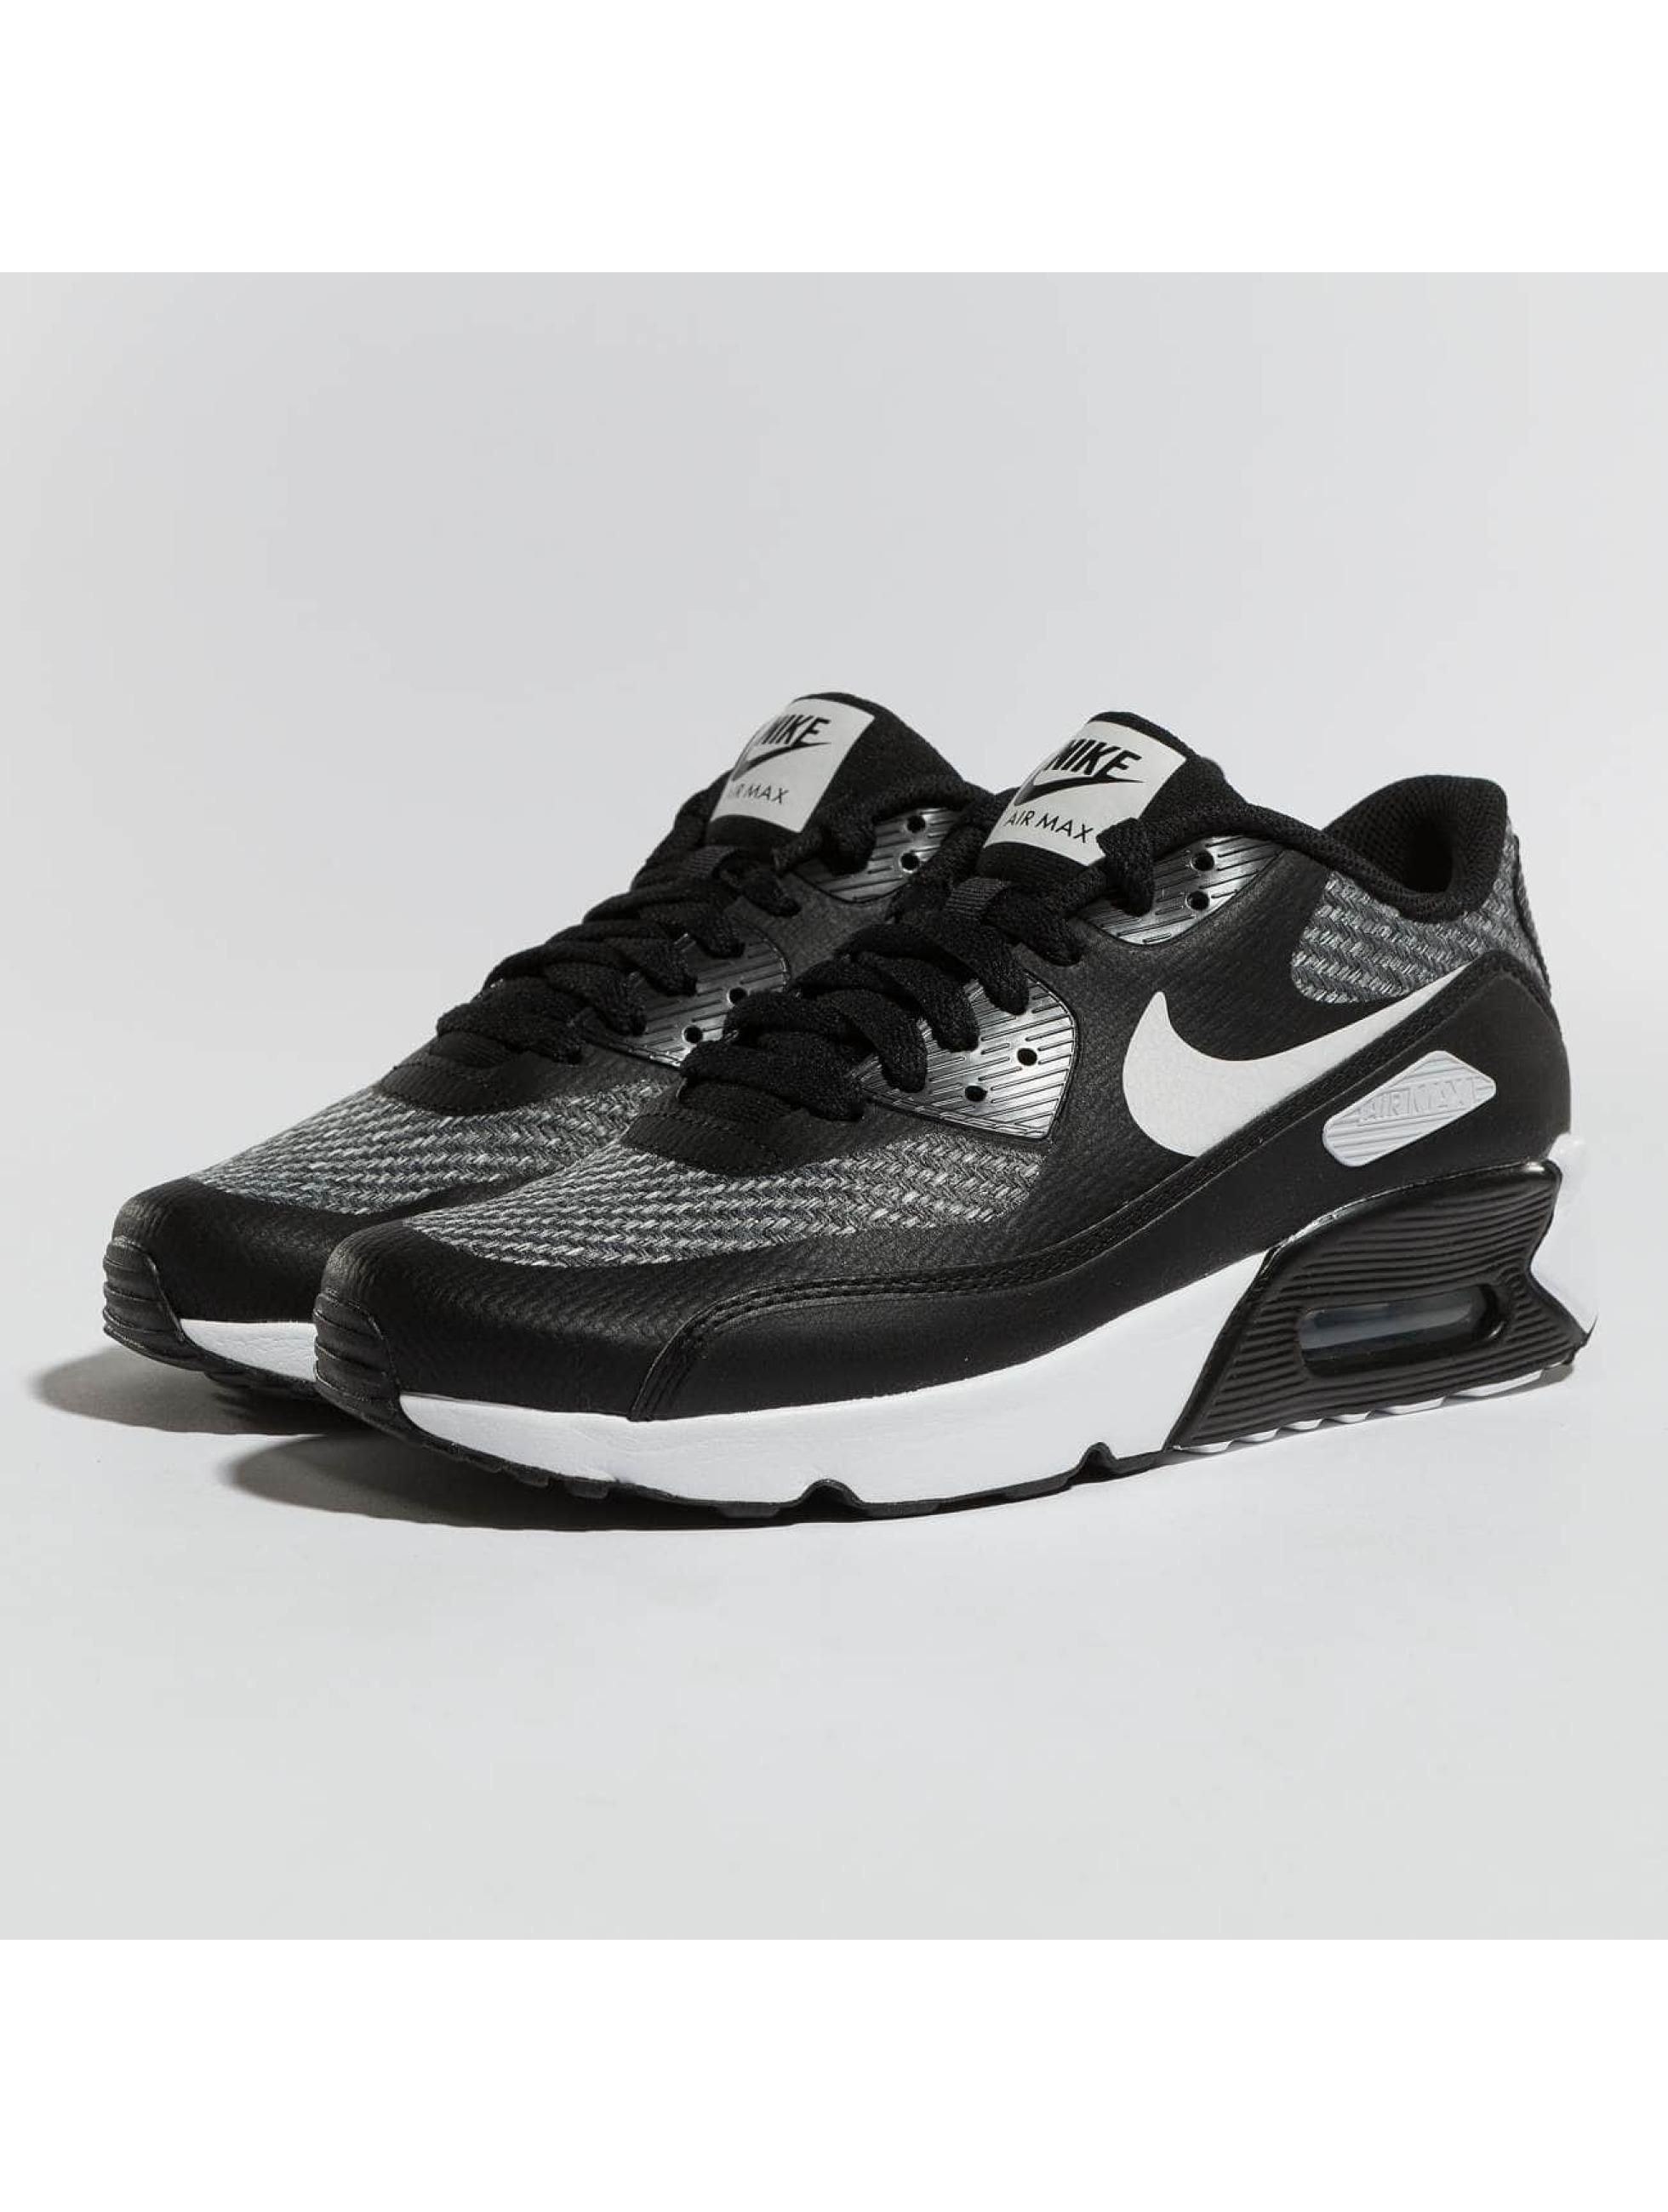 on sale 95c6a a062d Nike Sneakers Air Max 90 svart